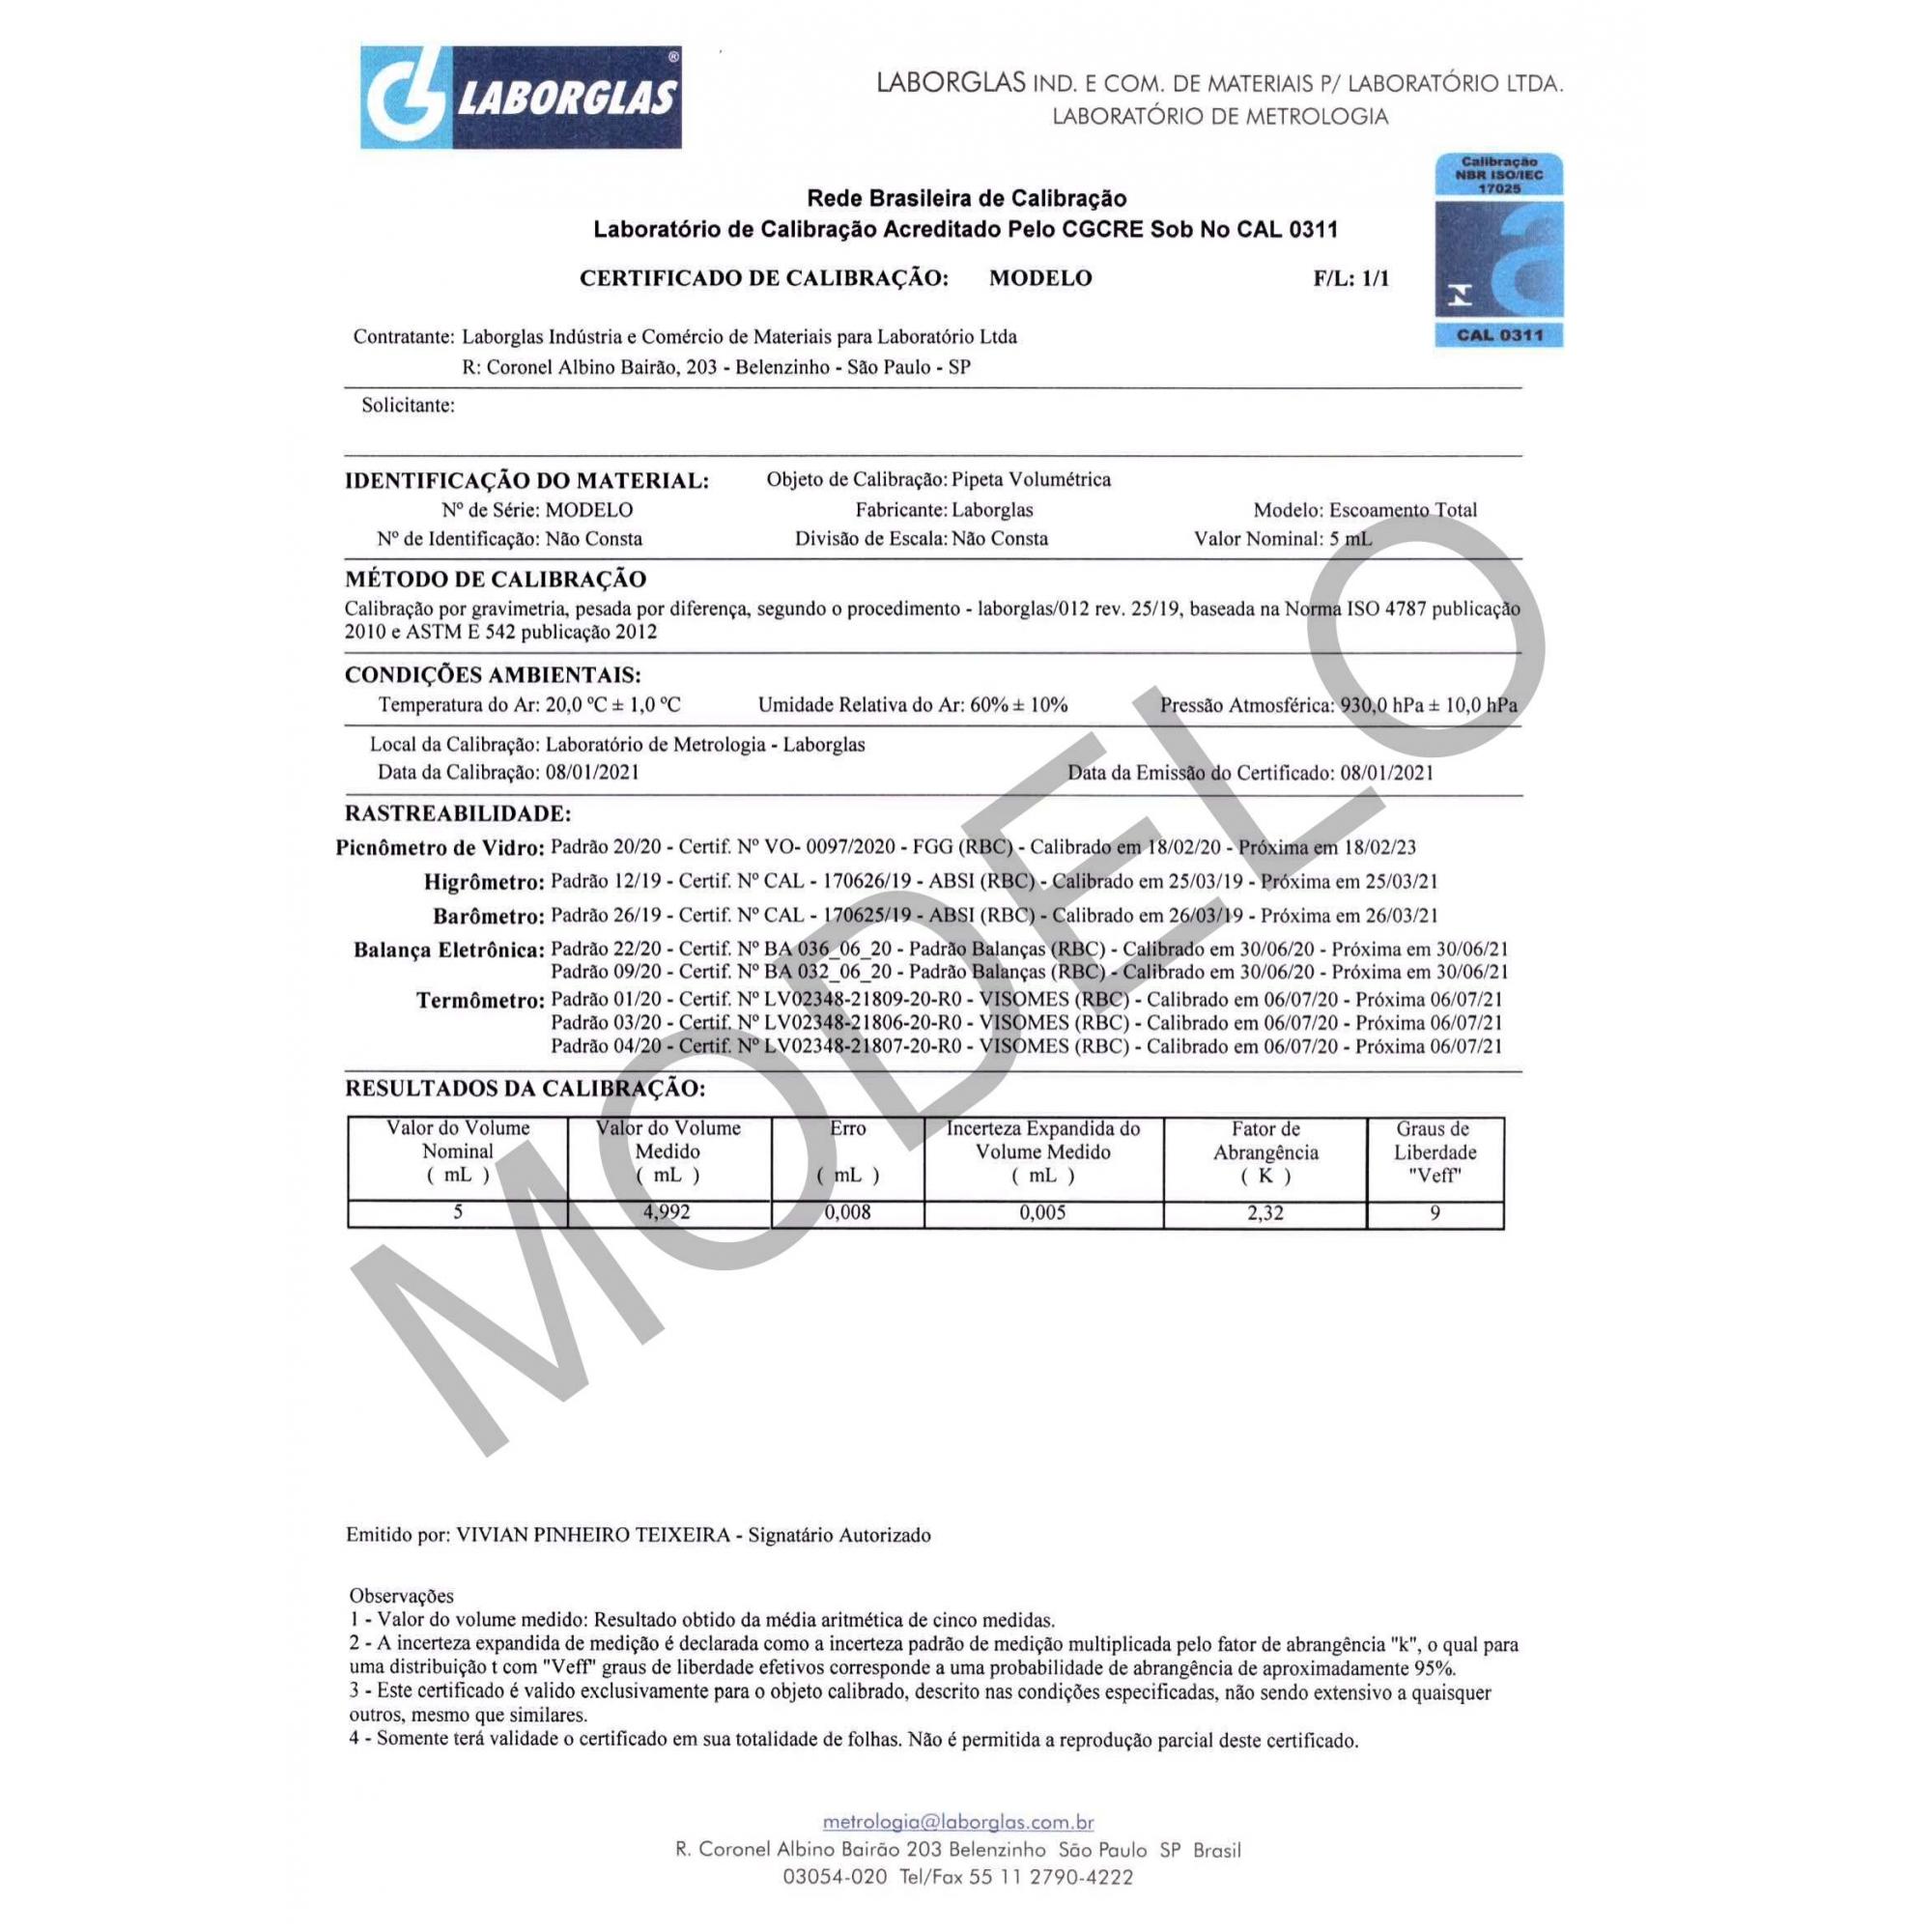 PIPETA VOLUMÉTRICA ESGOTAMENTO TOTAL 4 ML CERTIFICADO RBC - Laborglas - Cód. 9433705-R